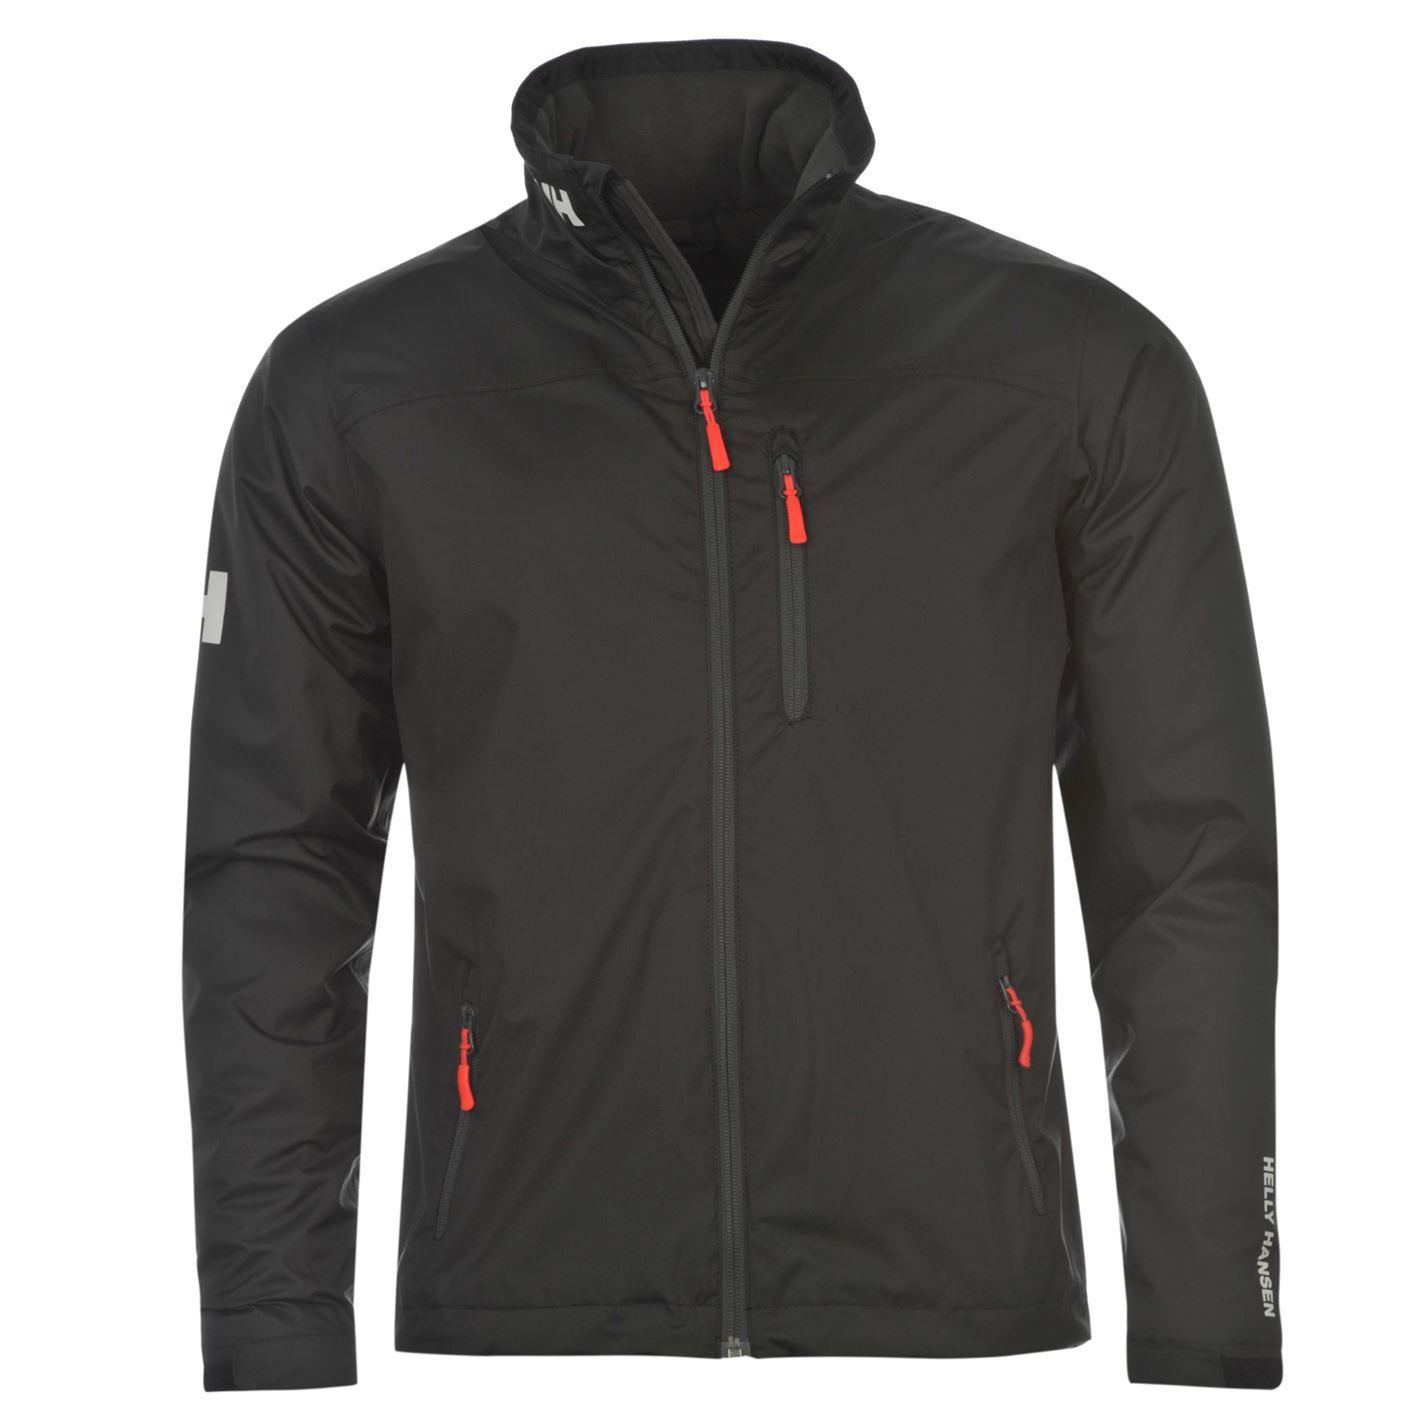 Helly Hansen Crew Waterproof Jacket Coat Mens Black Ebay